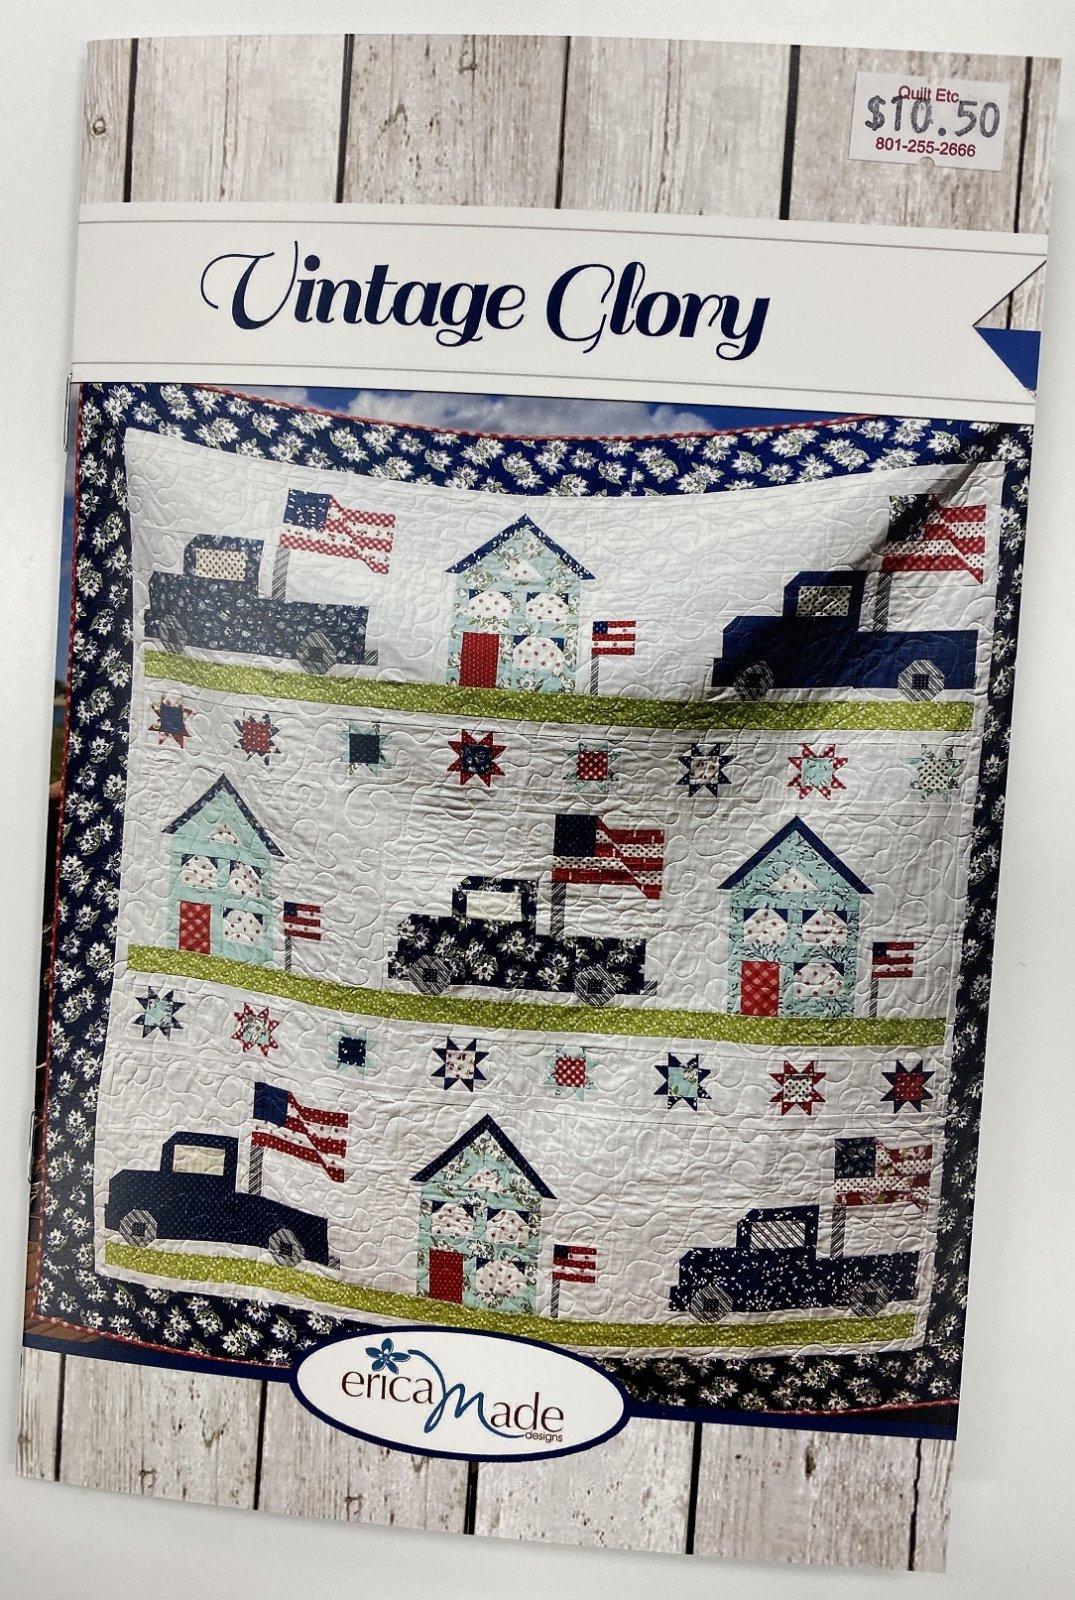 Vintage Glory Pattern